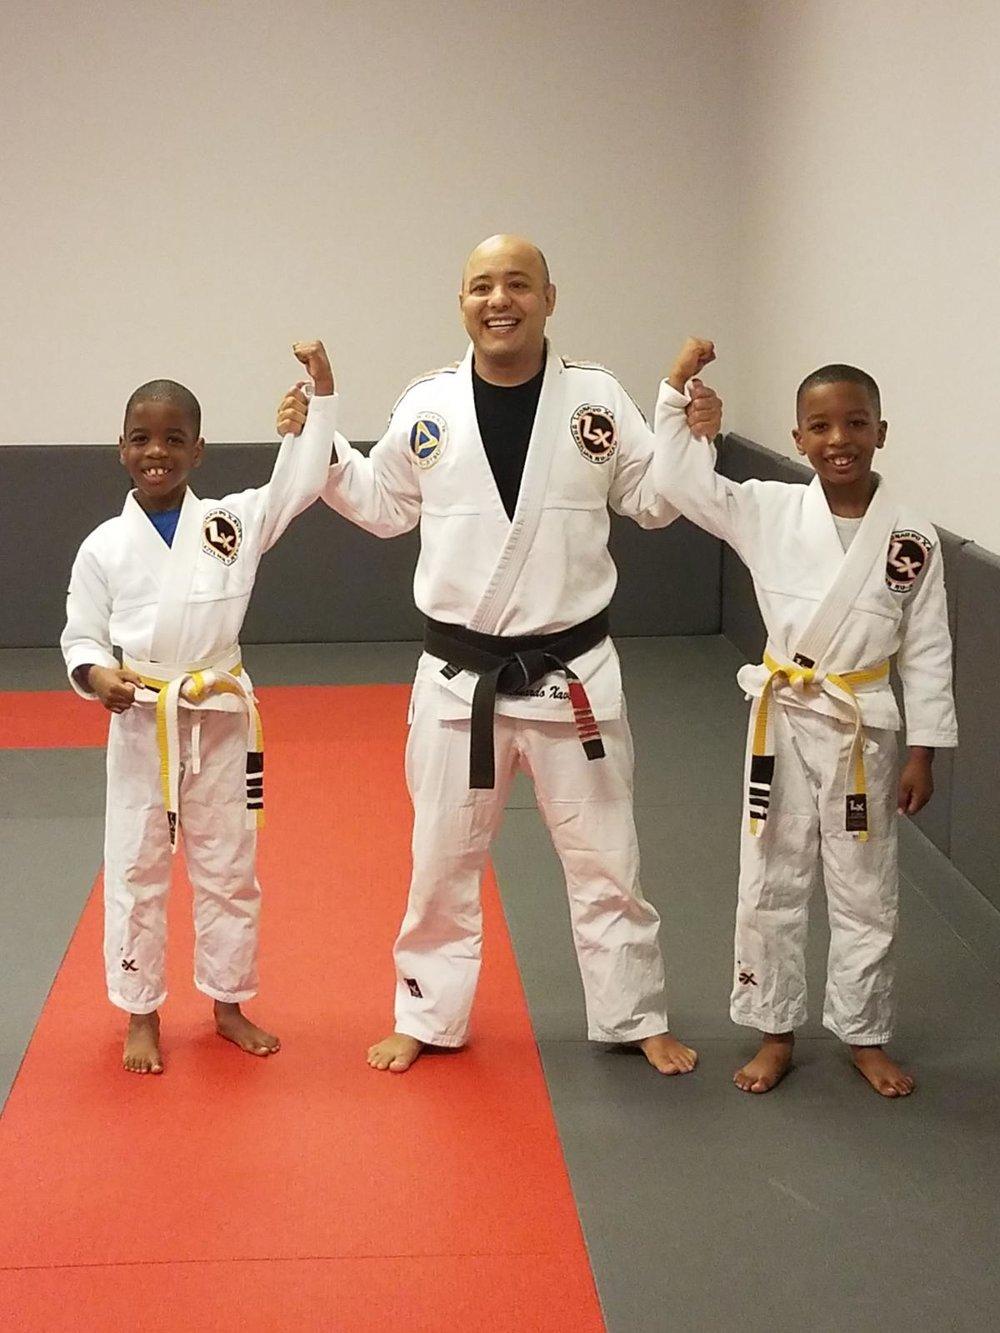 David & Joshua belt promotion - Brazilian Jiu-Jitsu